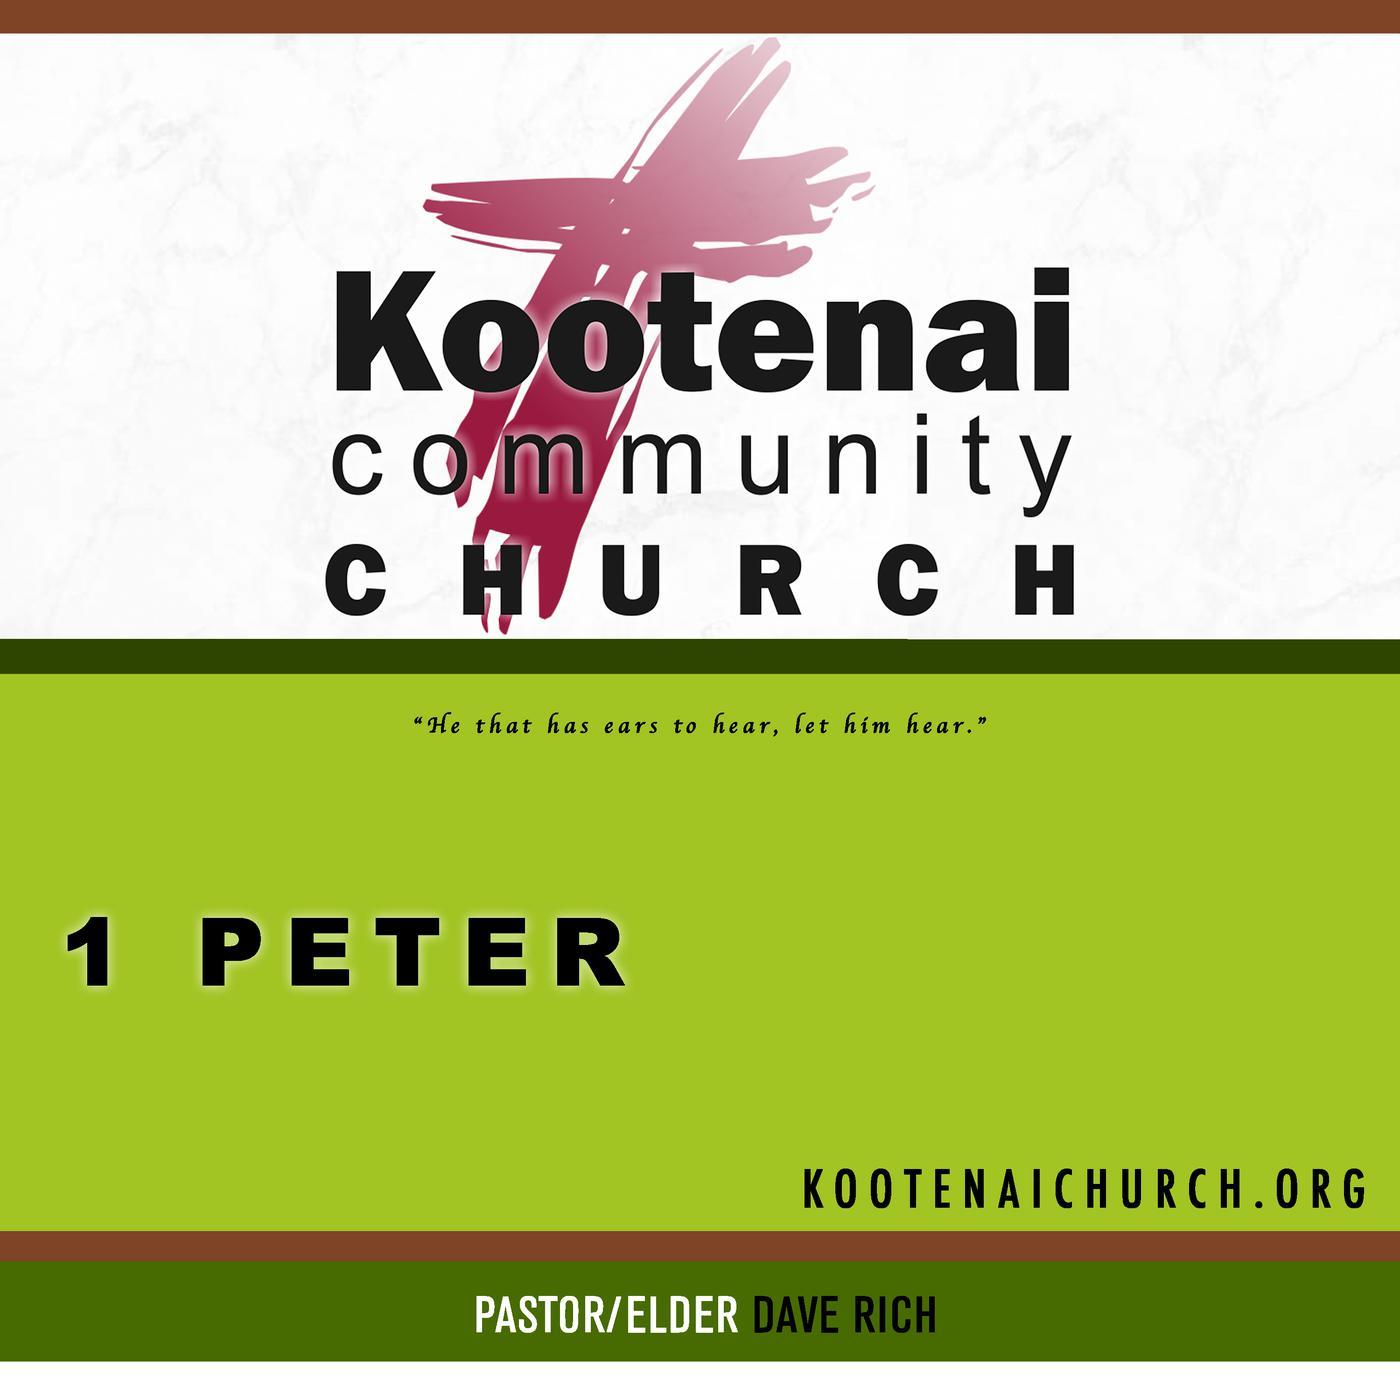 Kootenai Church: 1 Peter (podcast) - Kootenai Church: 1 Peter